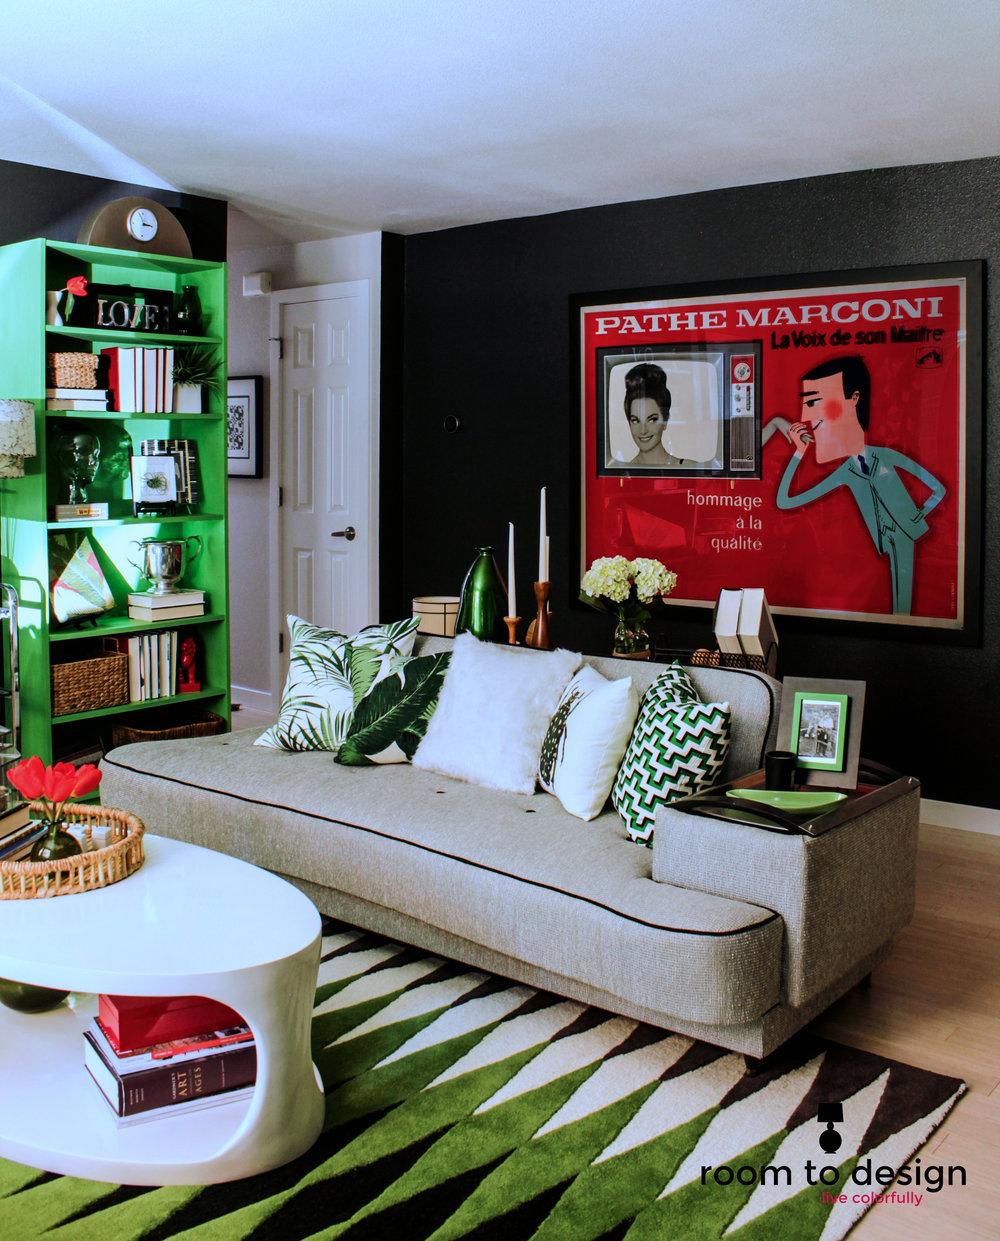 large-artwork-interior-design.jpg